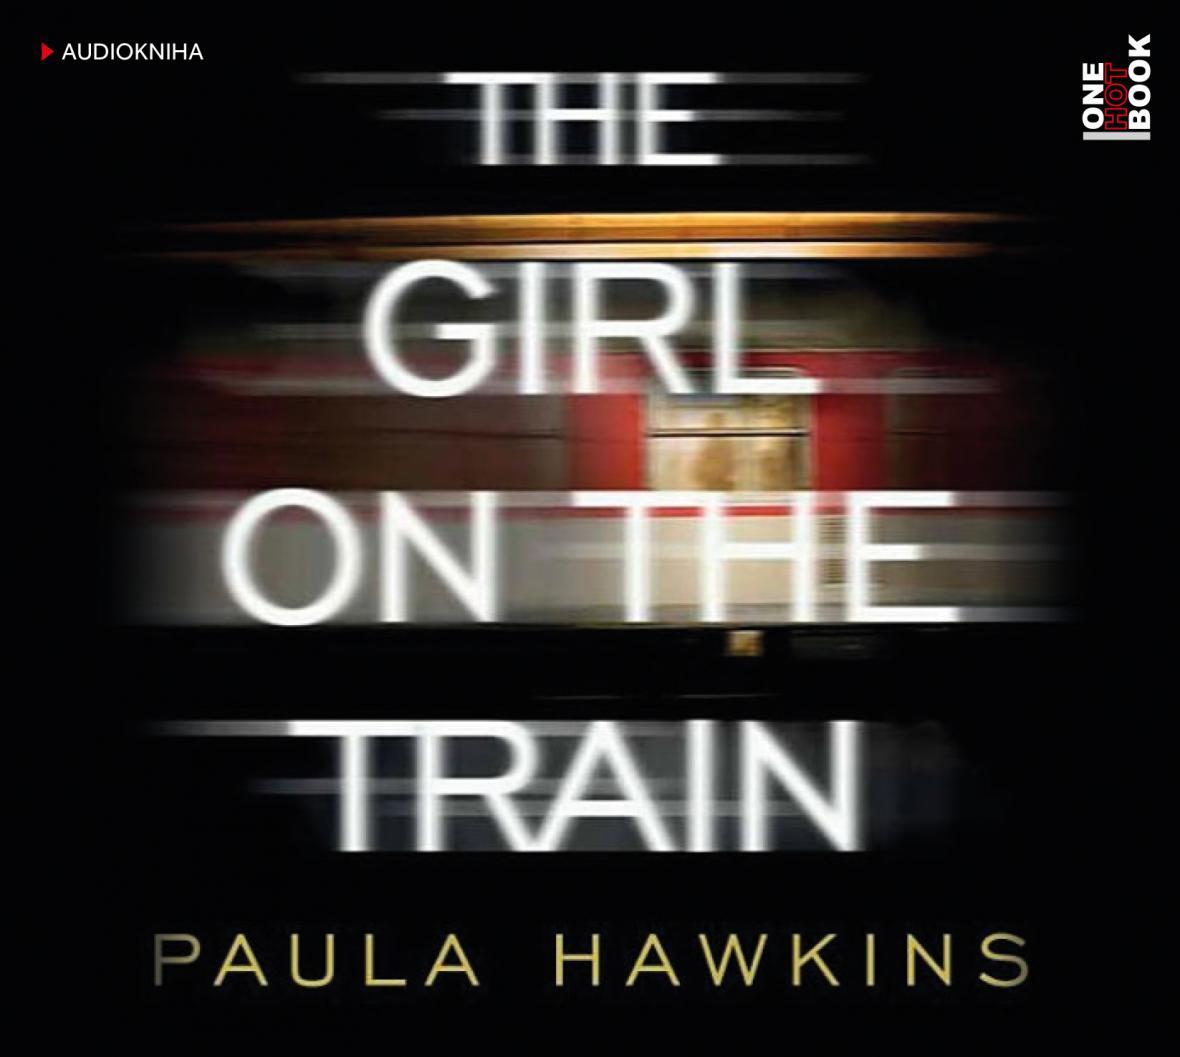 Dívka ve vlaku (audiokniha)